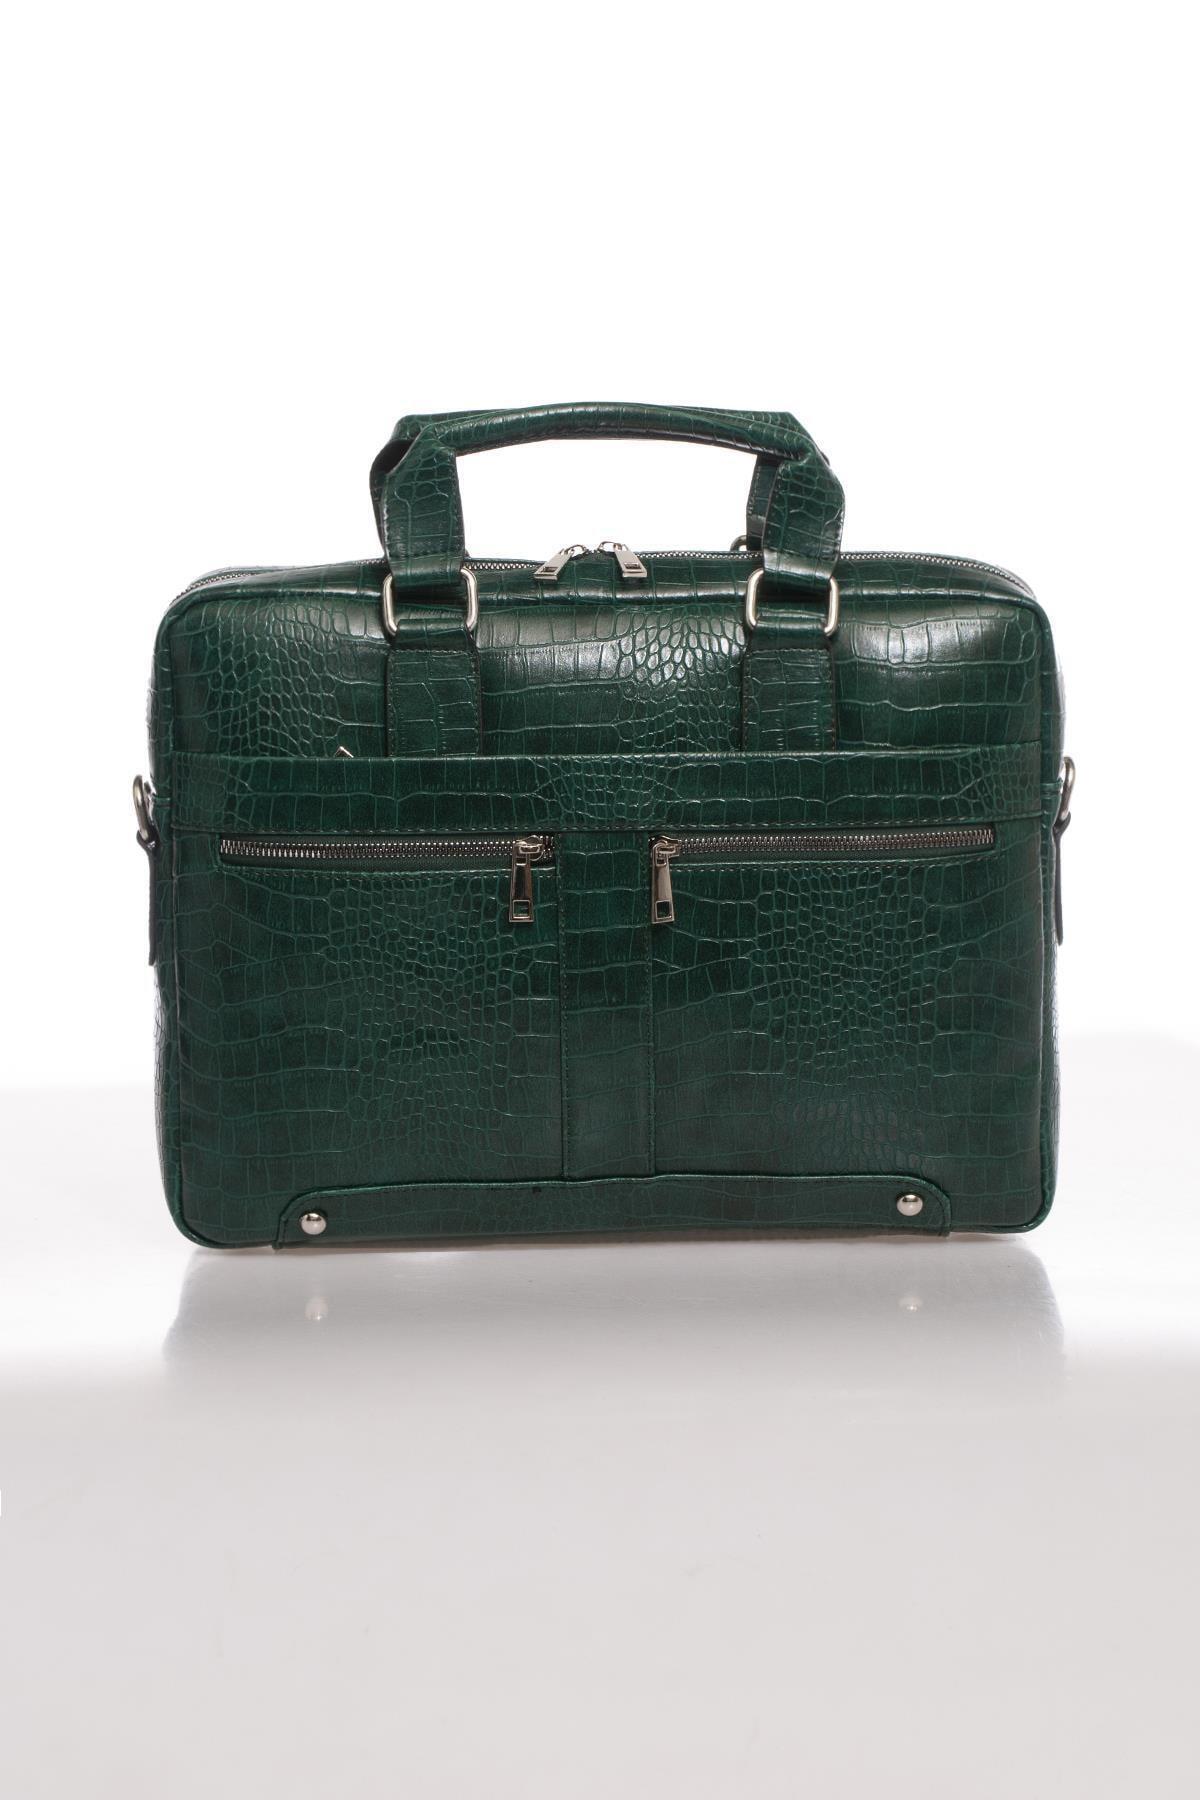 Sergio Giorgianni Luxury Mpist9141 Kroko Yeşil Unısex Evrak Çantası 1